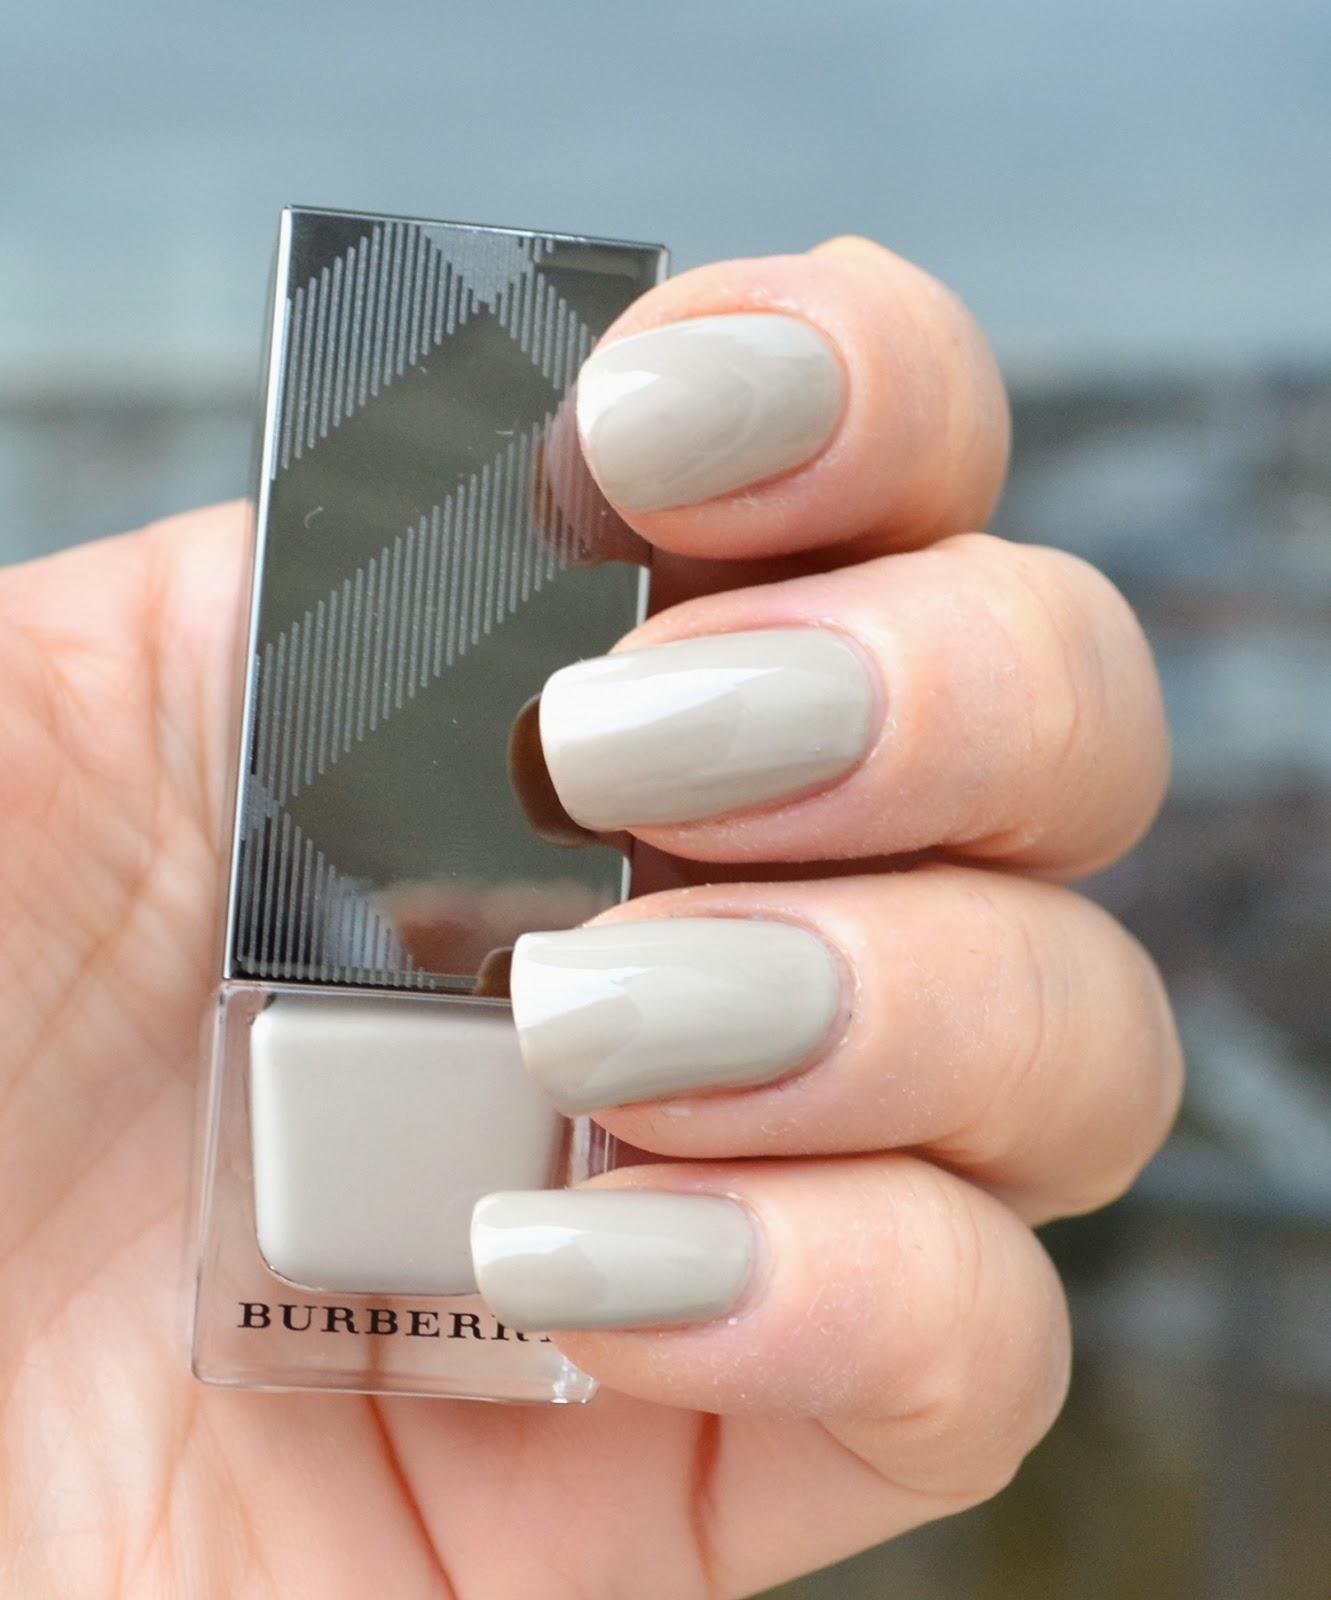 burberry fall 2015 nail polish